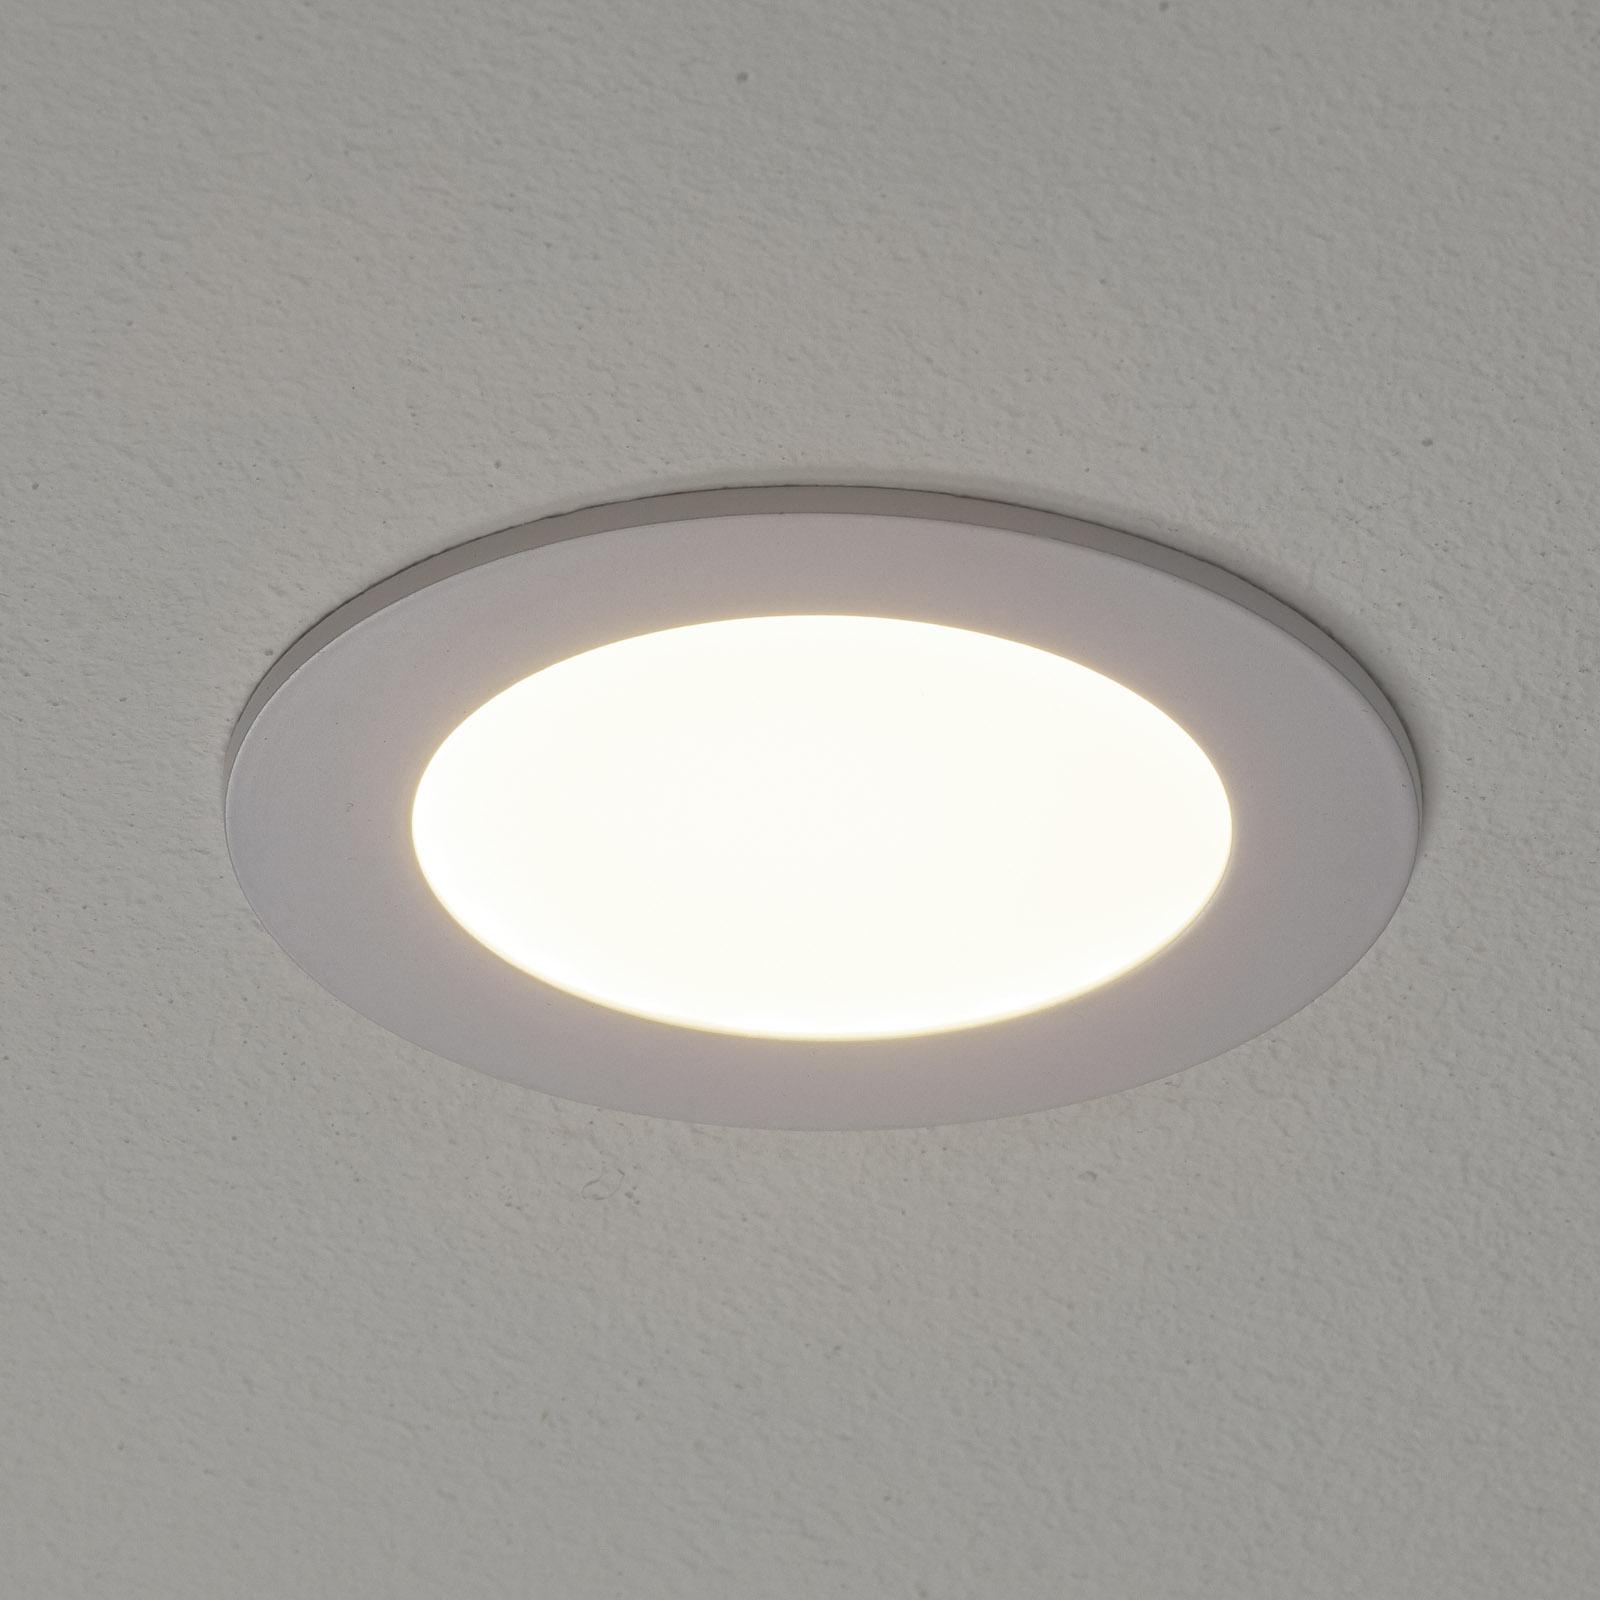 Eglo Connect Fueva-C innfellingslampe hvit 12 cm